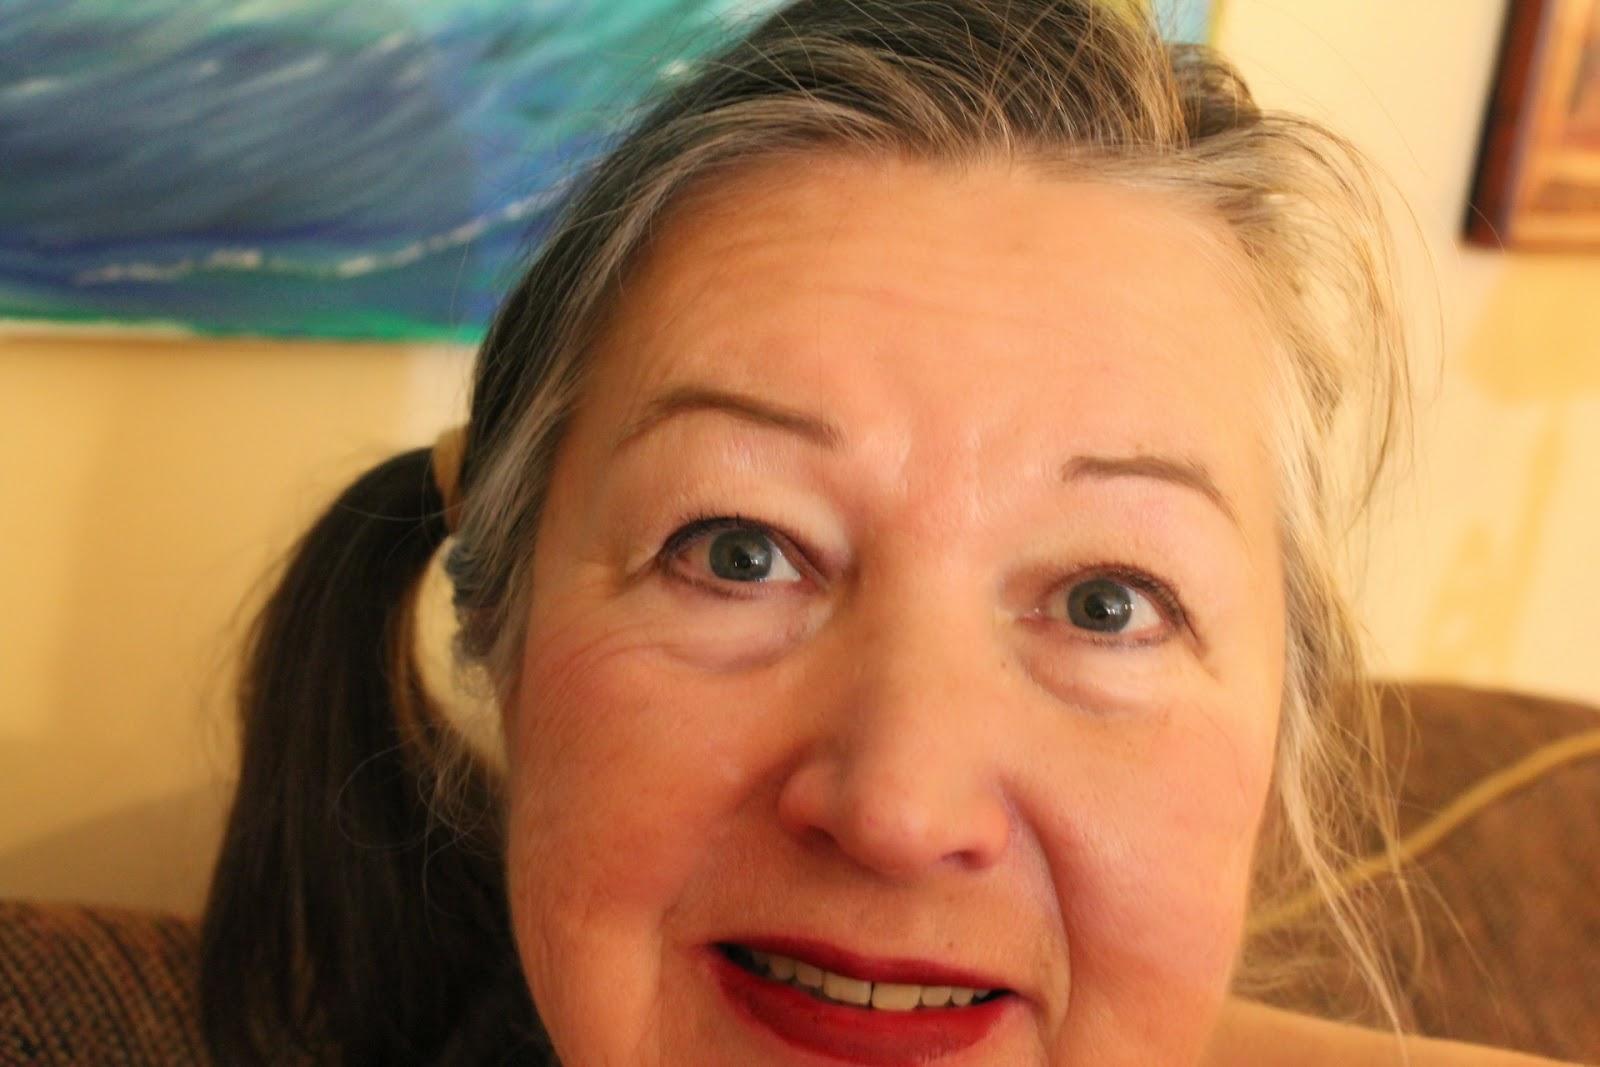 Selfie photo of me Gloria Poole of Missouri and Georgia in my living room on 15-Mar-2014.